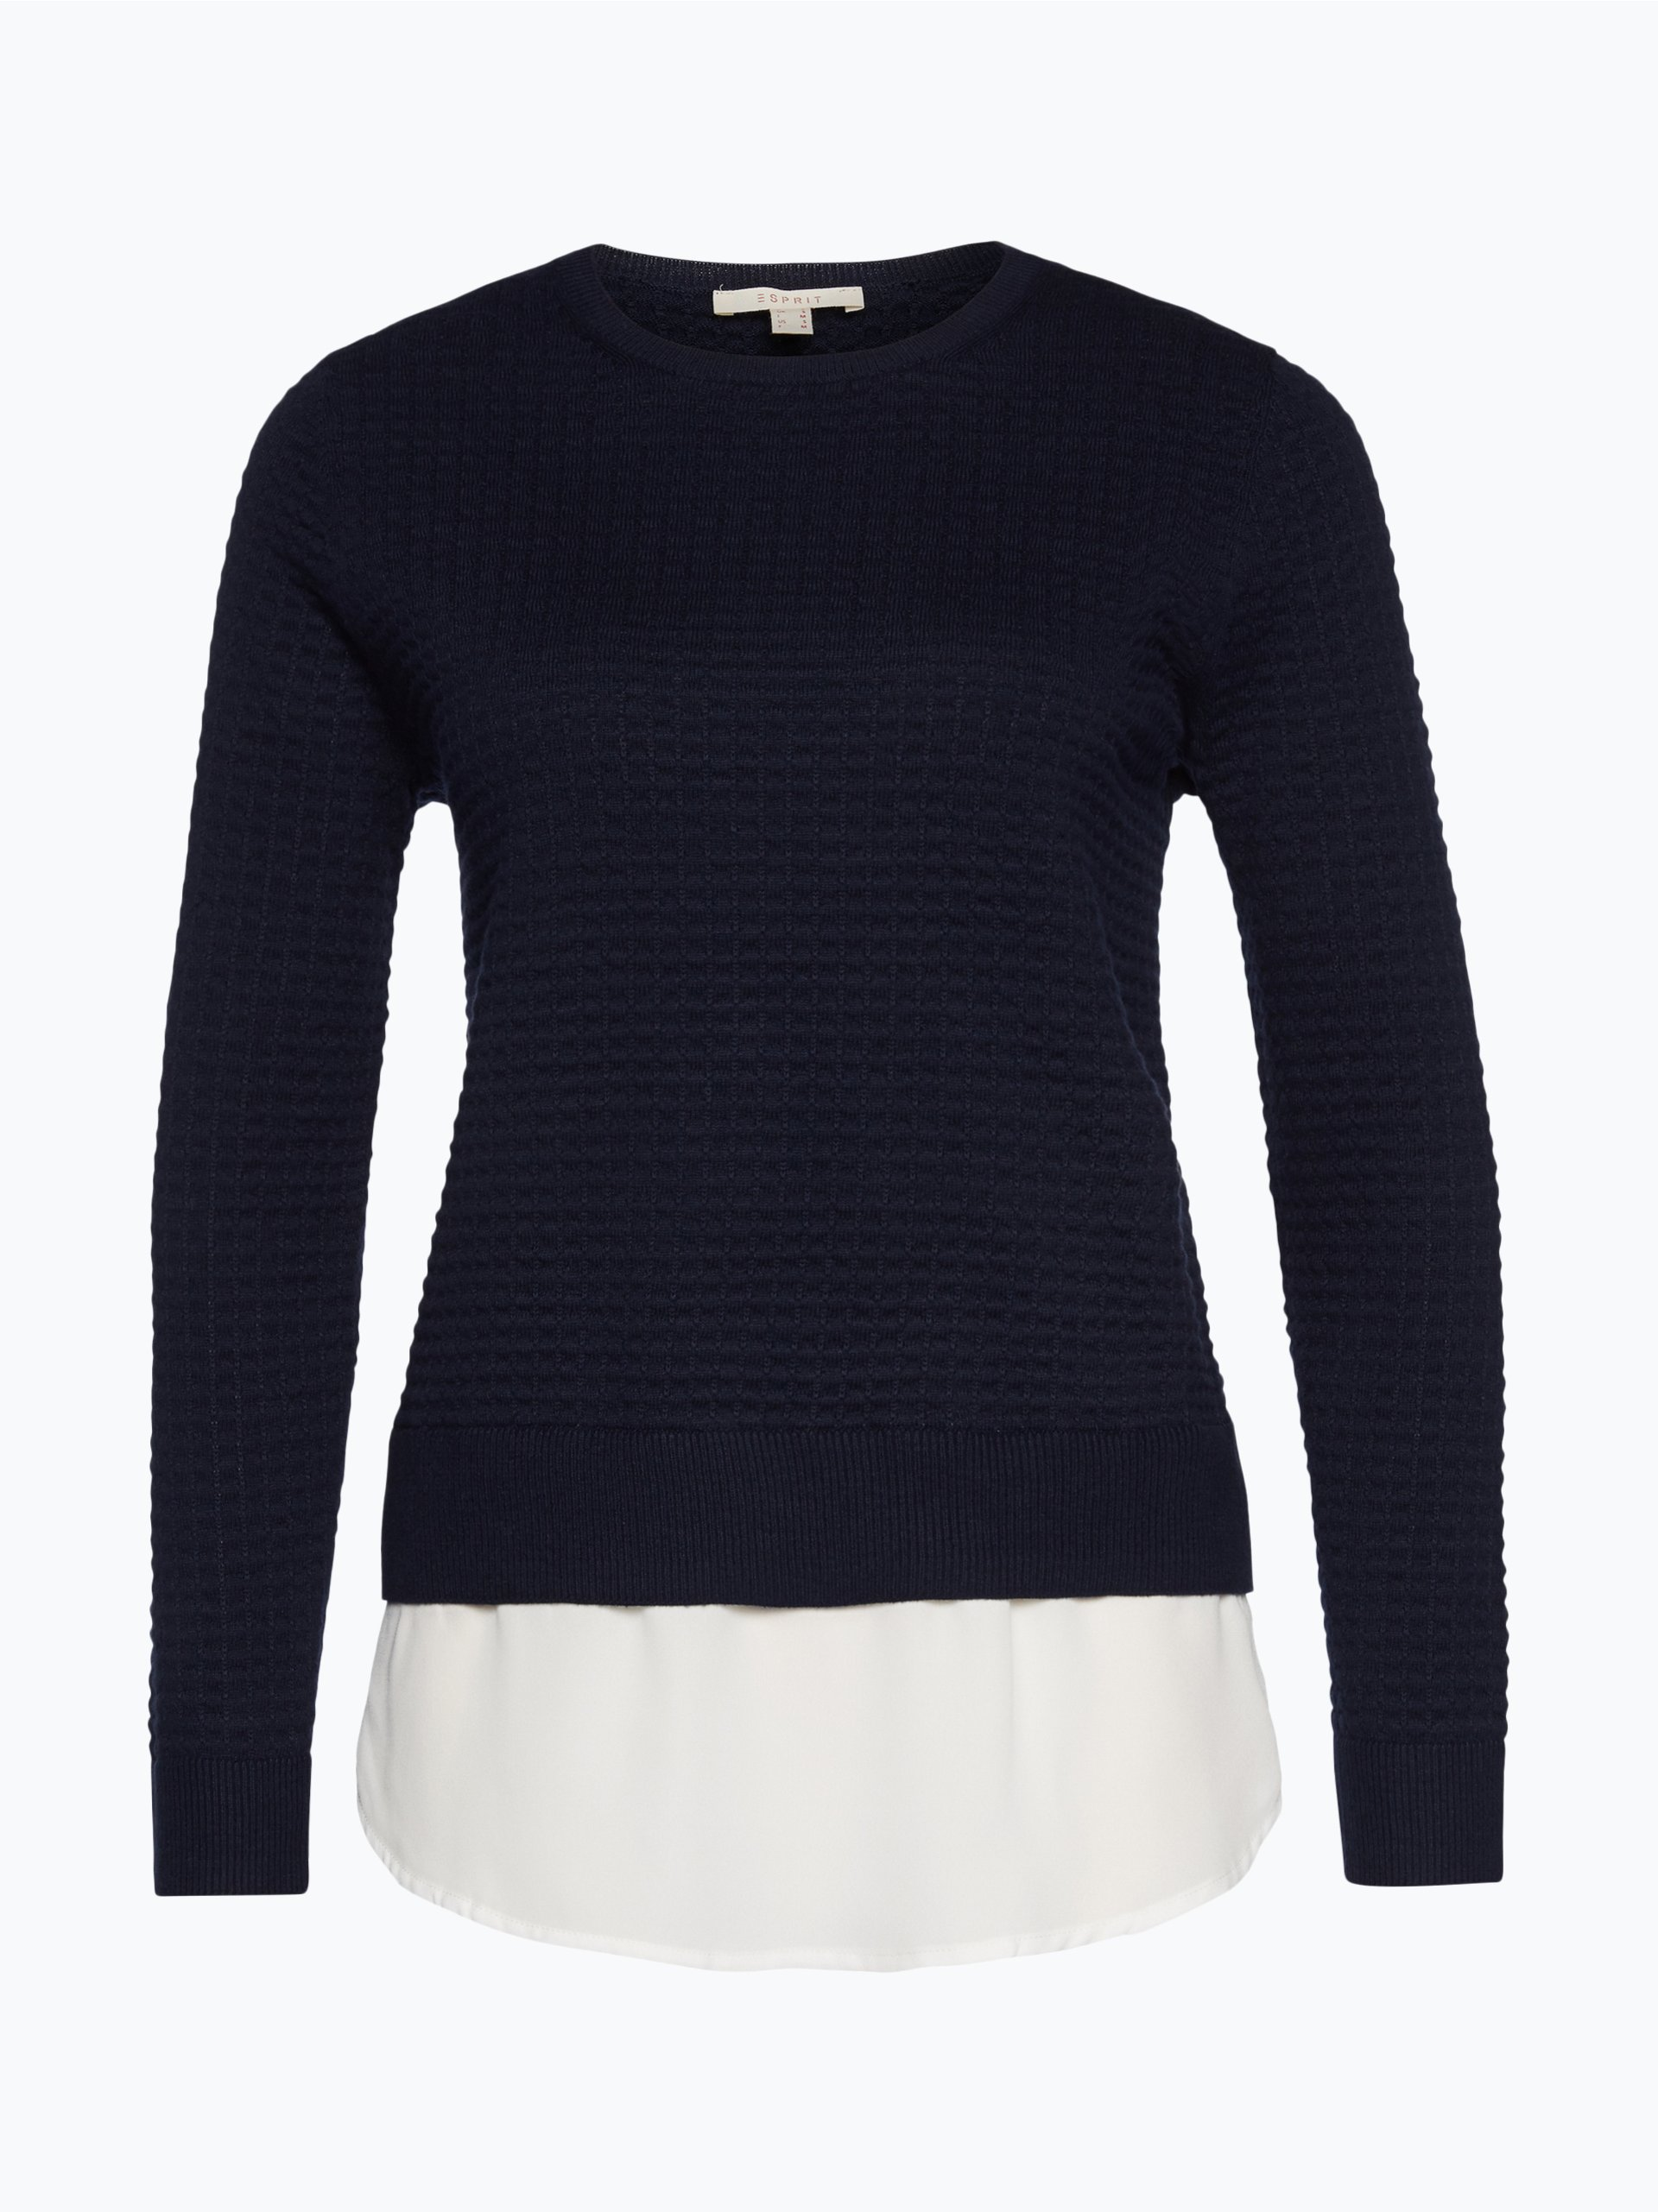 esprit casual damen pullover marine uni online kaufen. Black Bedroom Furniture Sets. Home Design Ideas